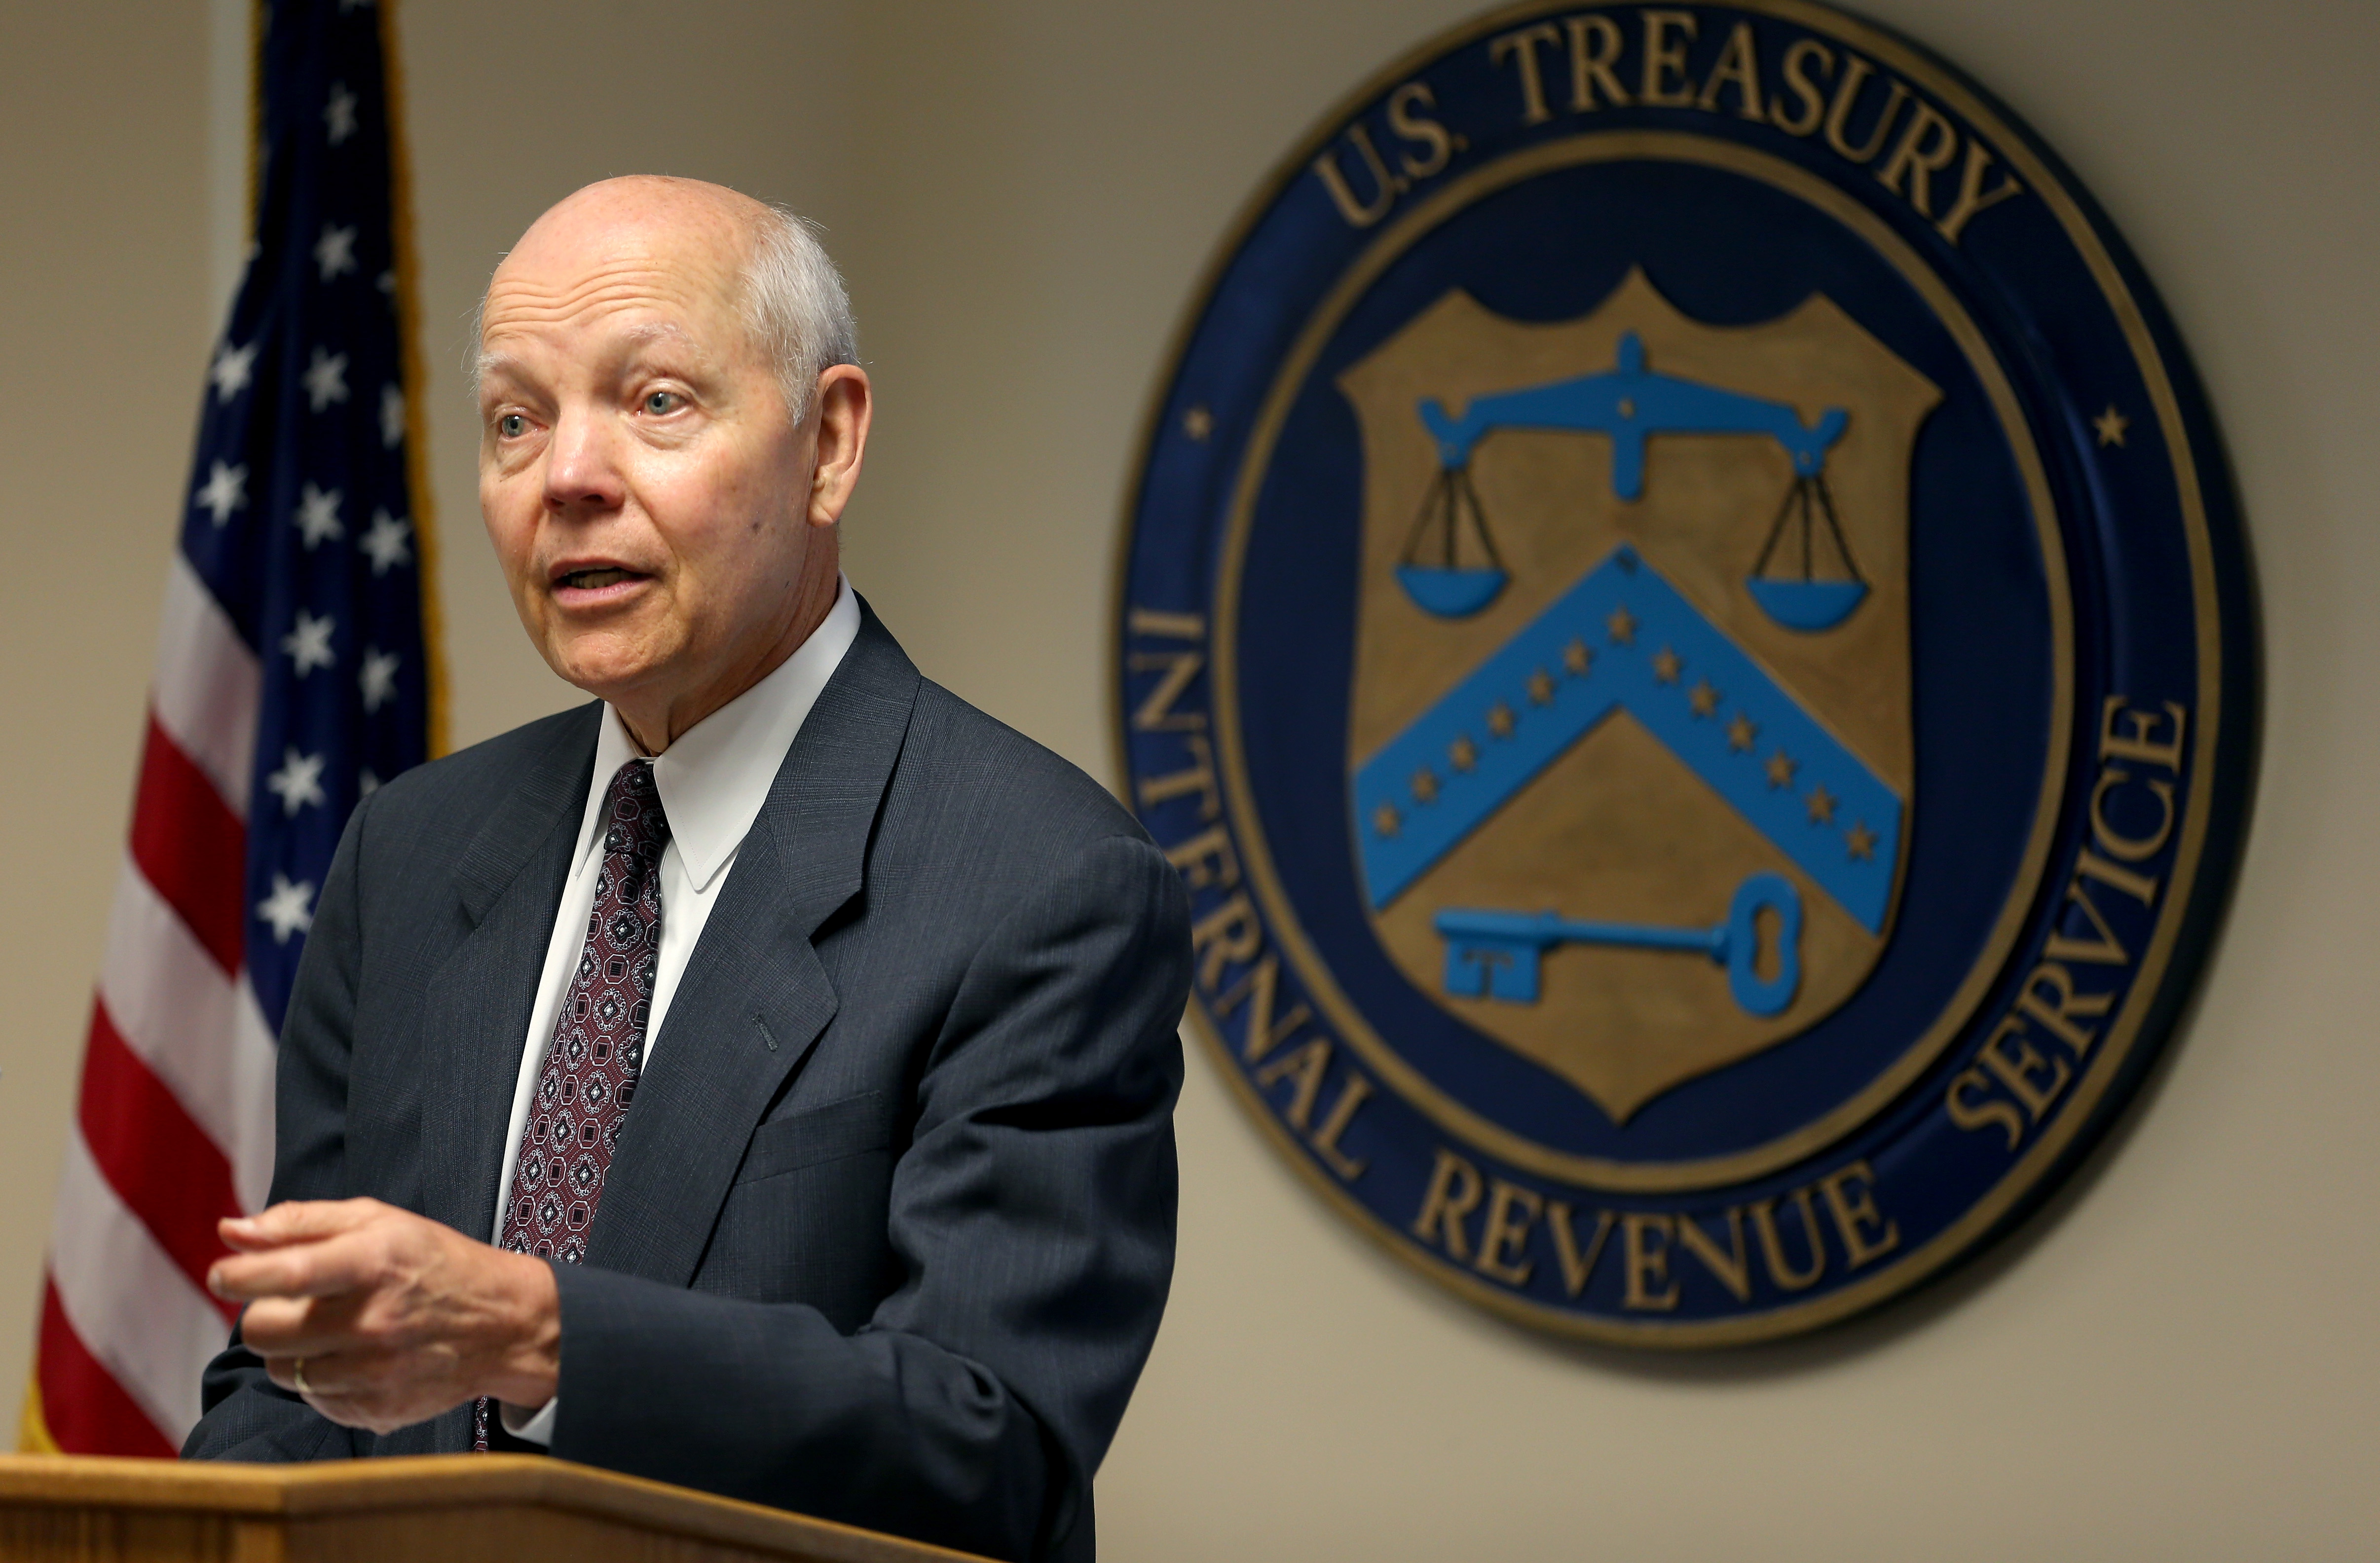 IRS Commissioner John Koskinen in 2014. (Getty)